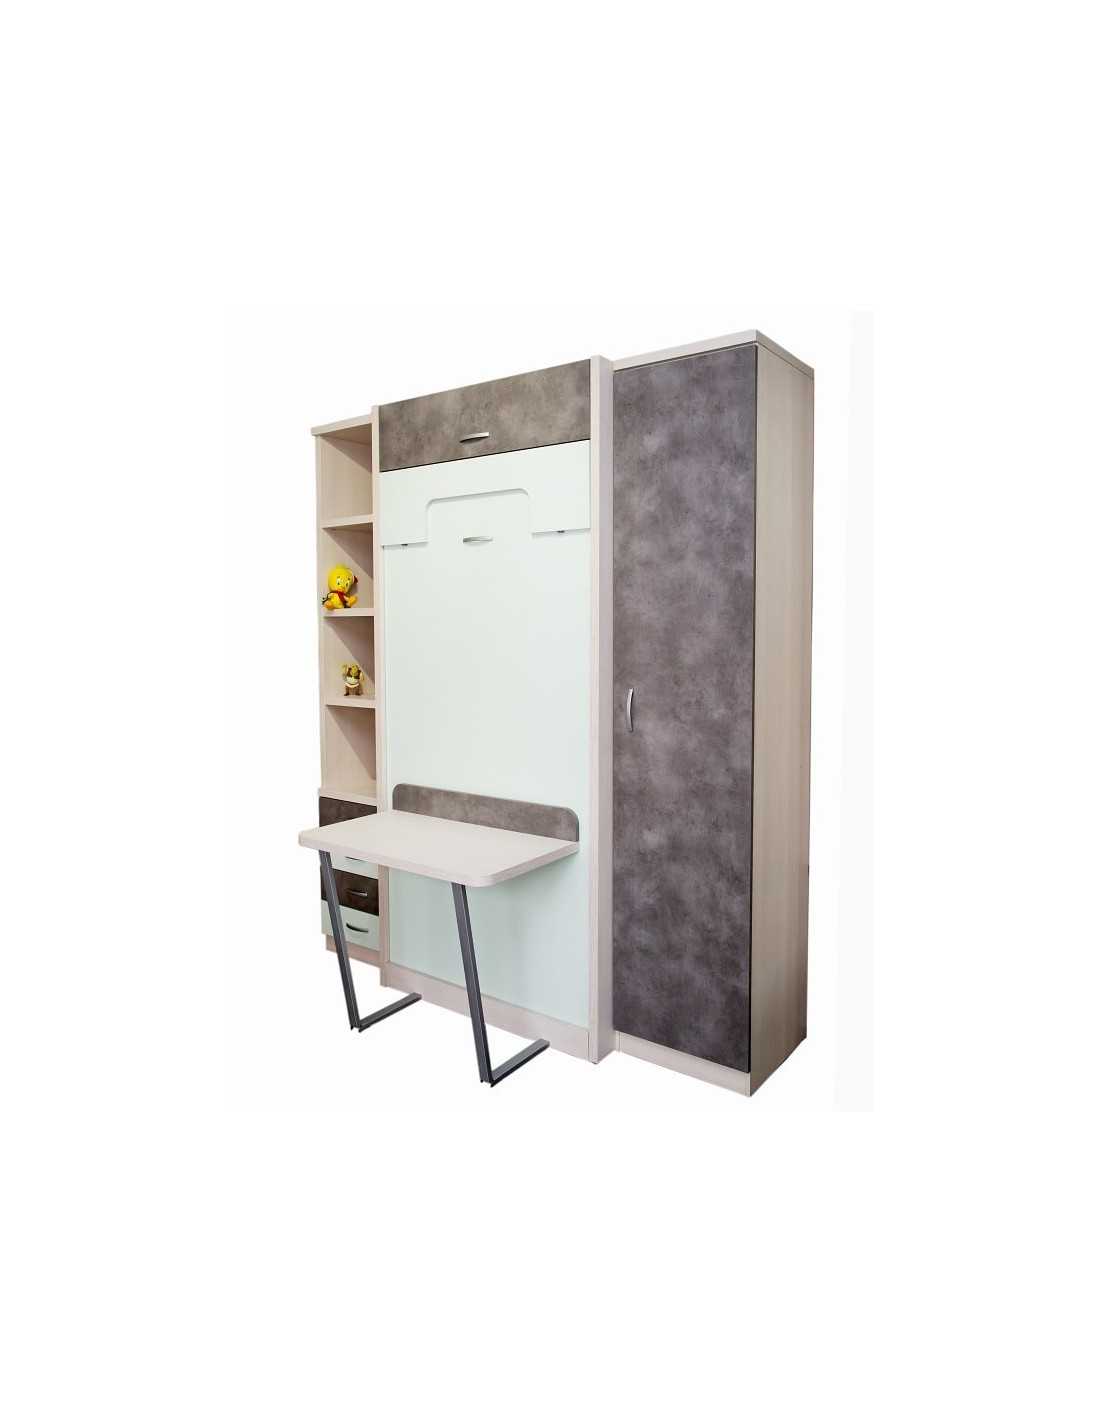 Literas abatibles verticales livemar solutions muebles noel madrid - Muebles literas abatibles ...